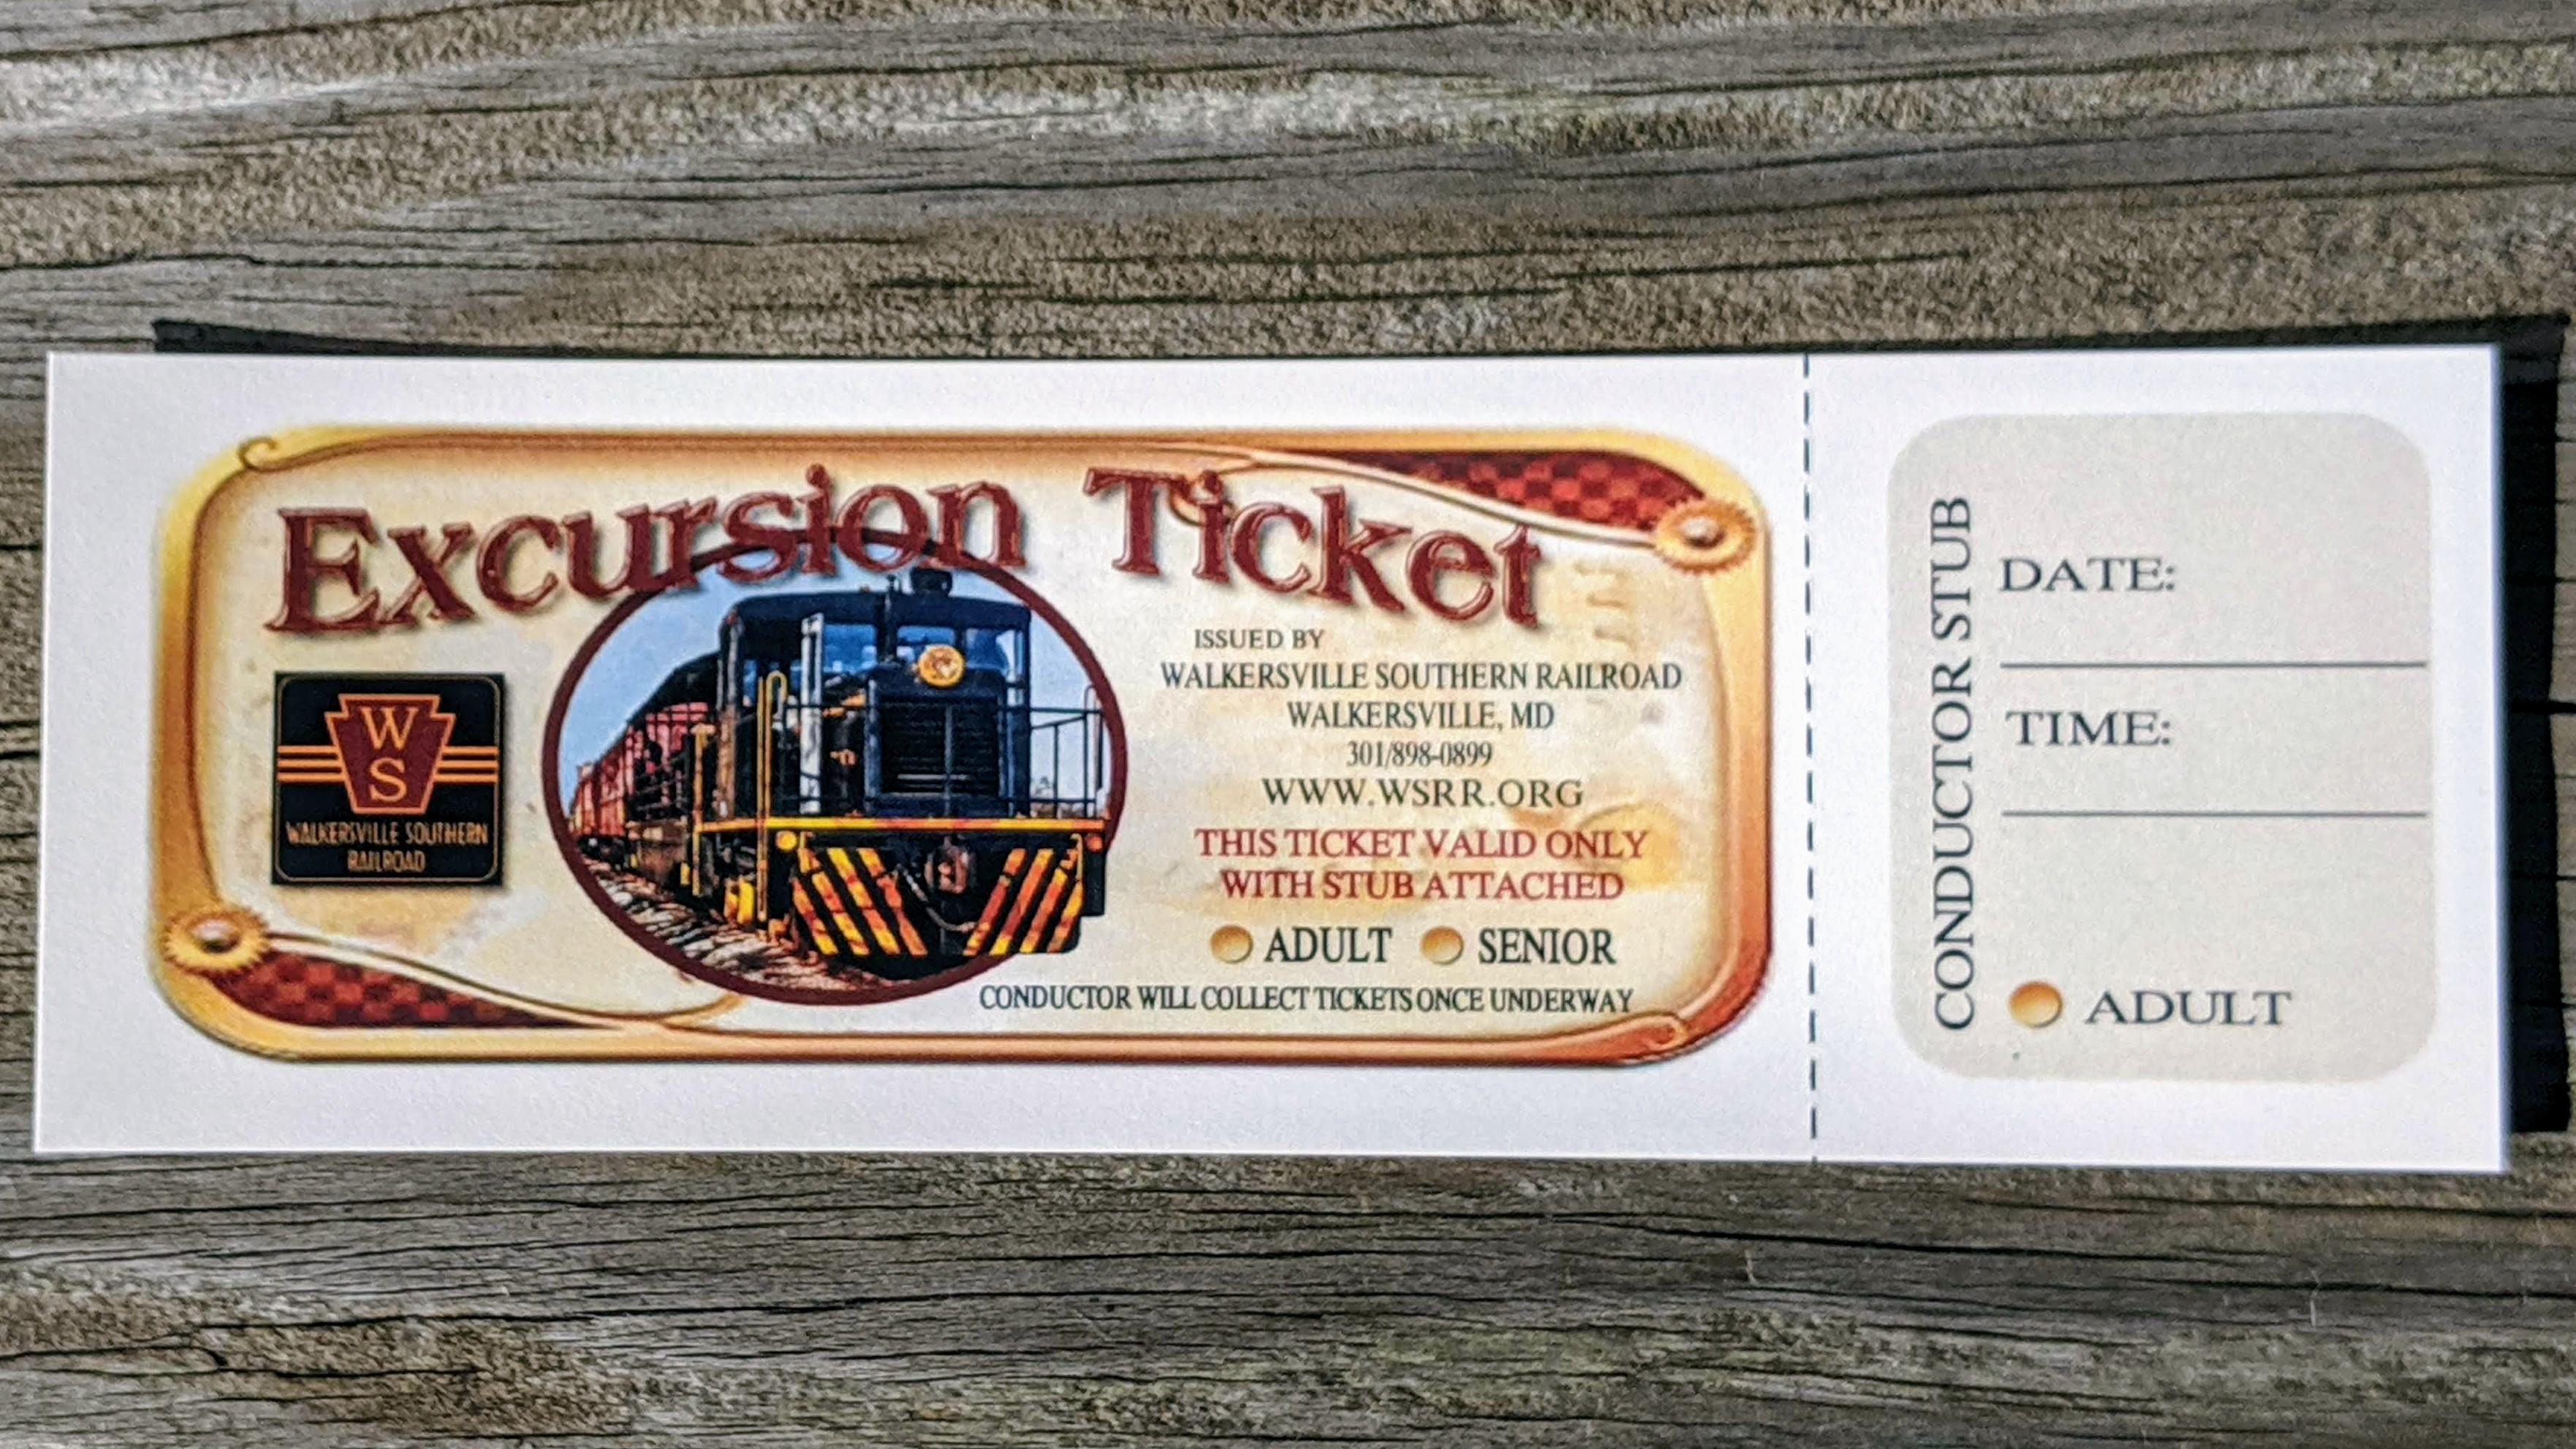 Autumn Excursion train ticket